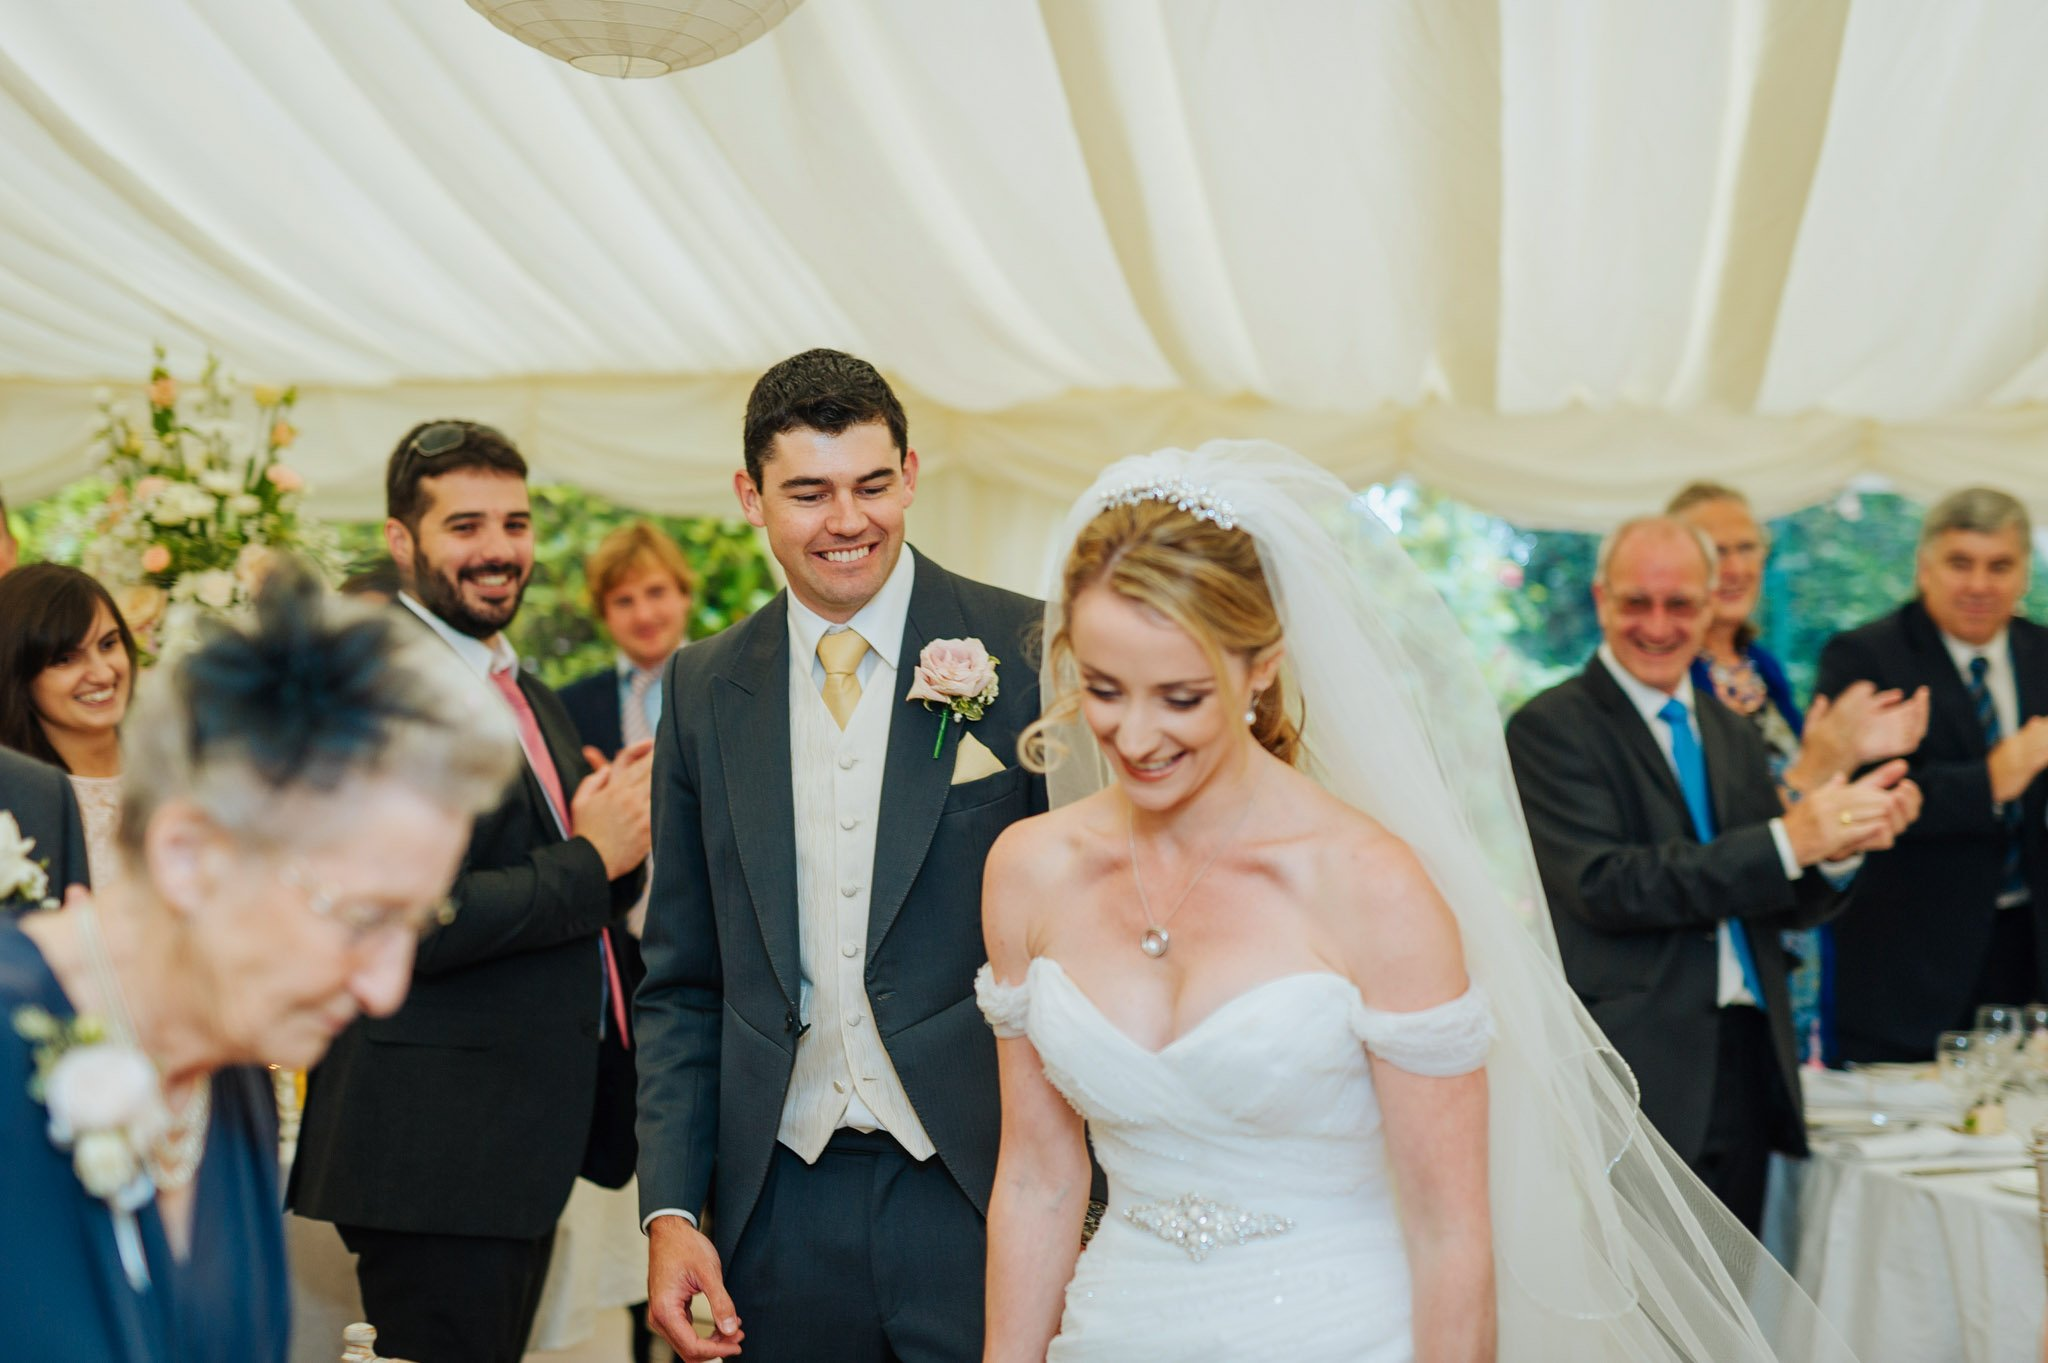 Georgina + Mike - Wedding photography in Malvern, Worcestershire 52